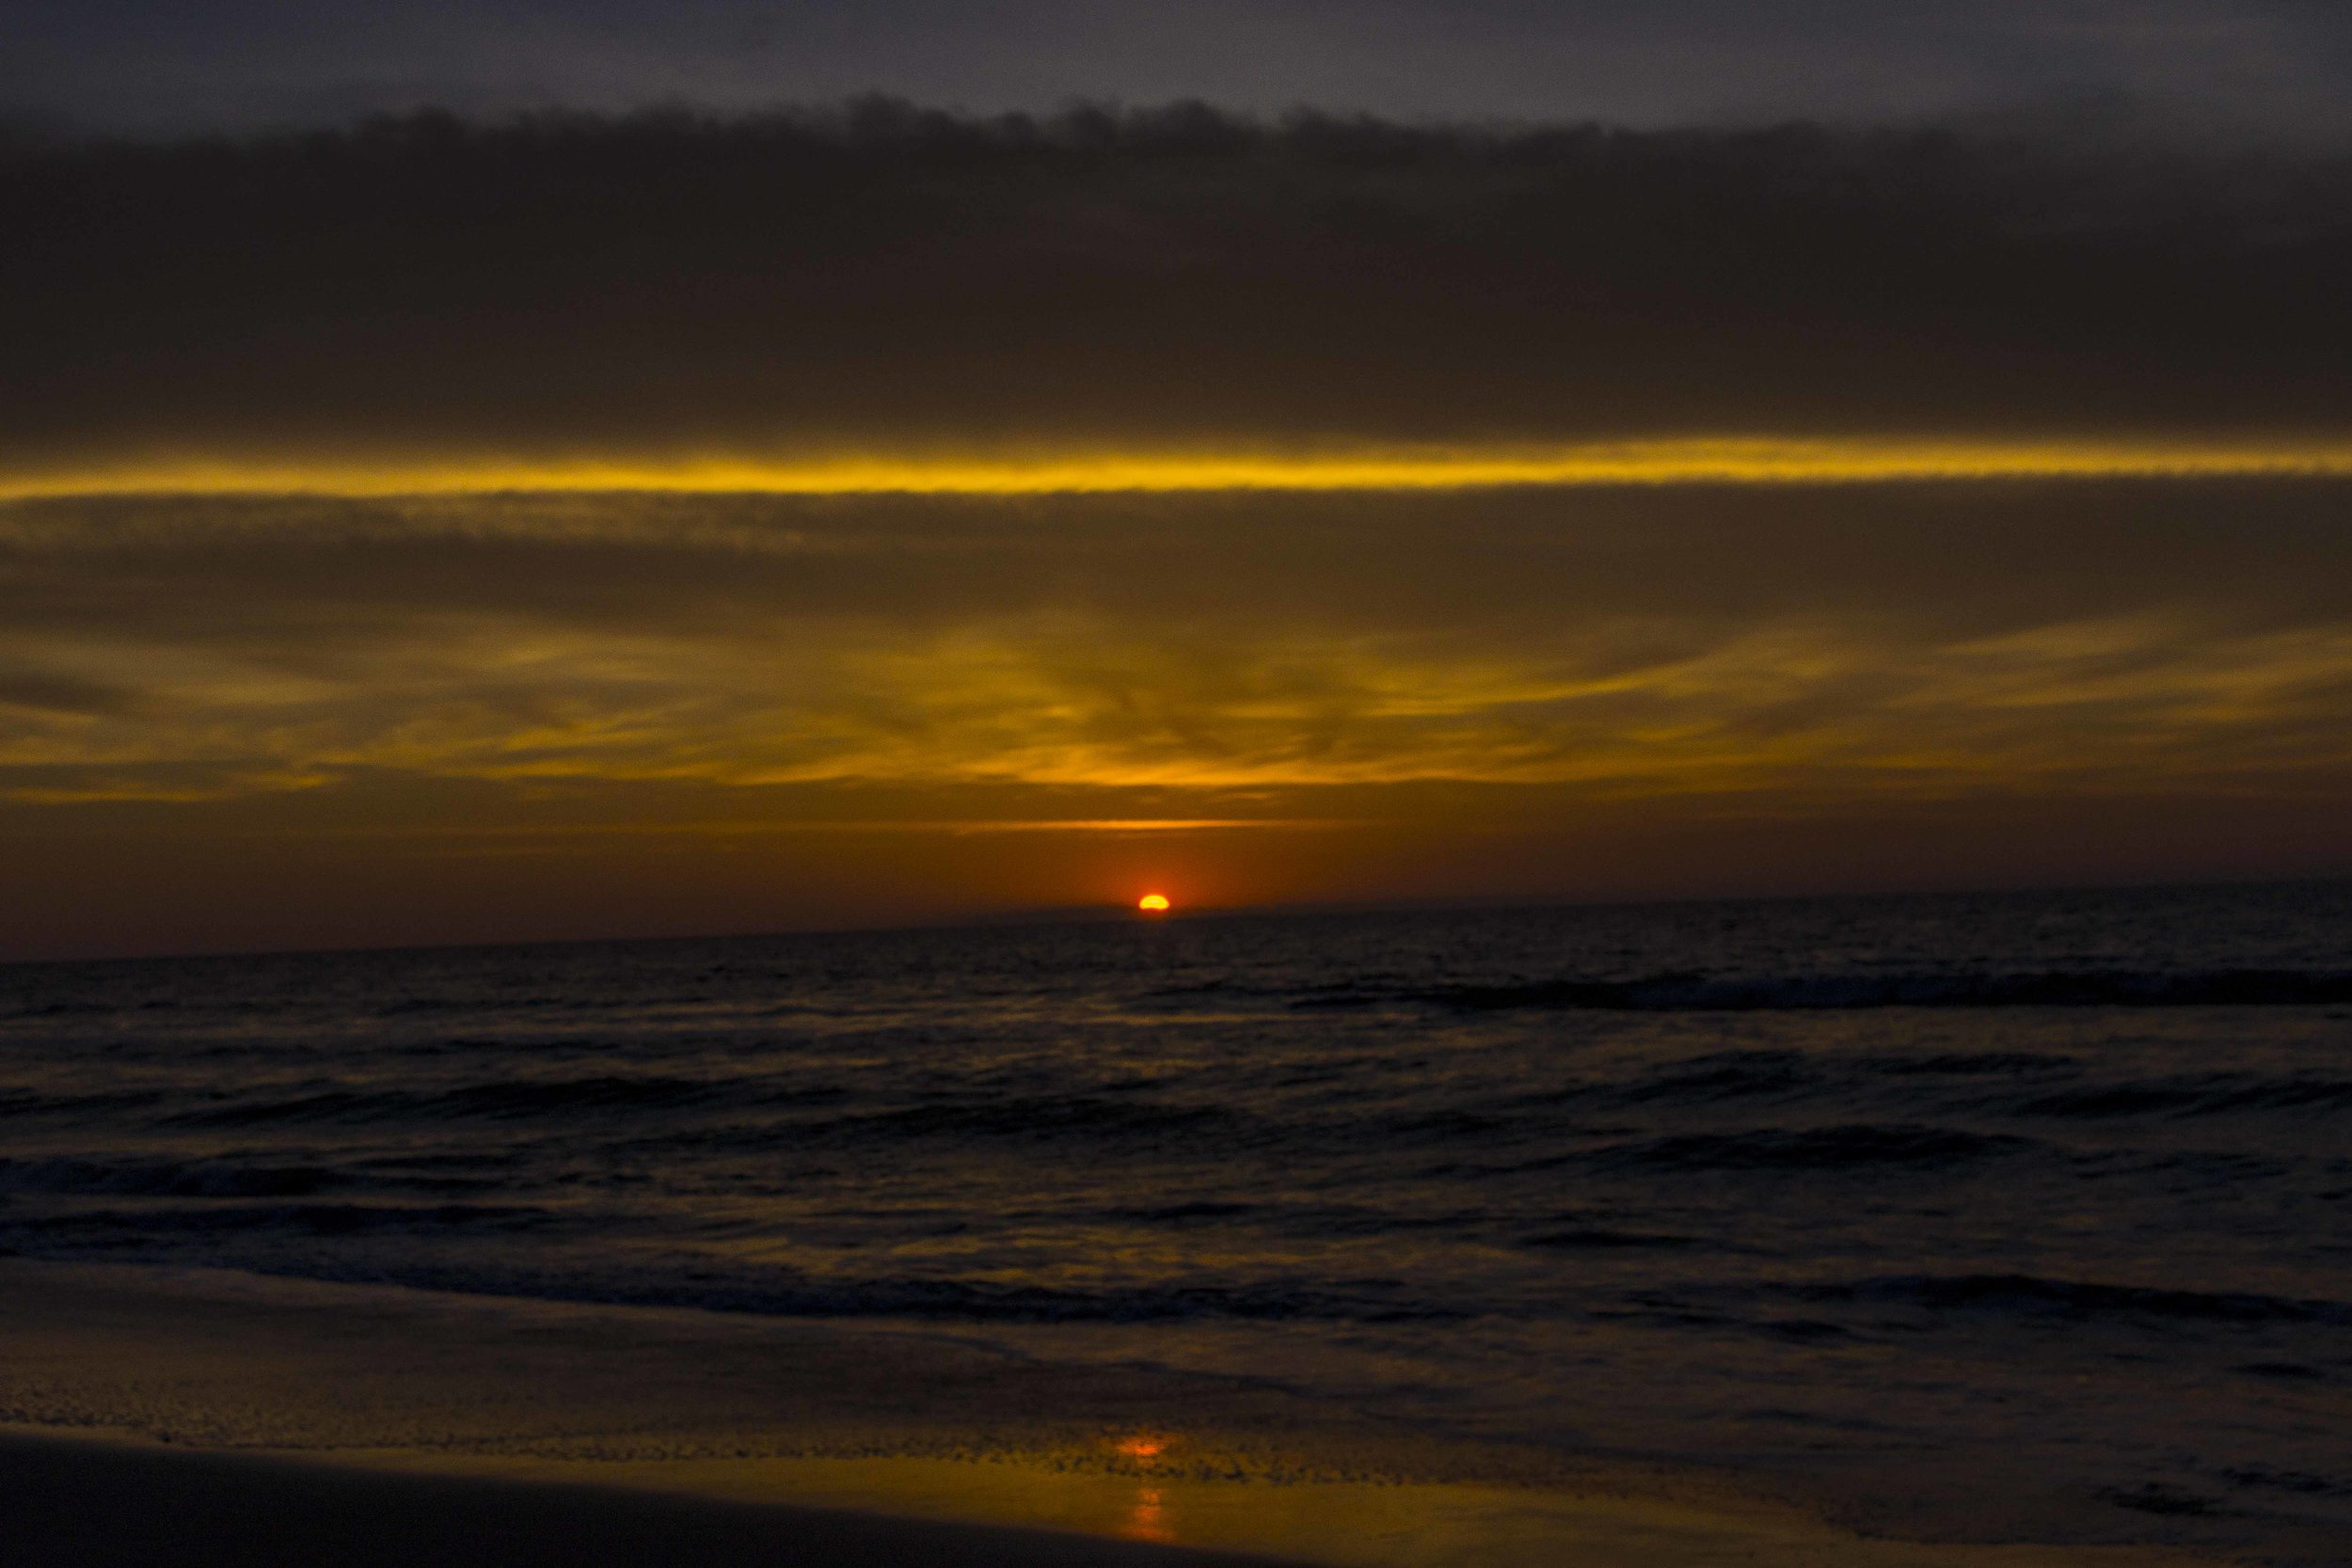 Sea of Light #1, 2011_1.jpg